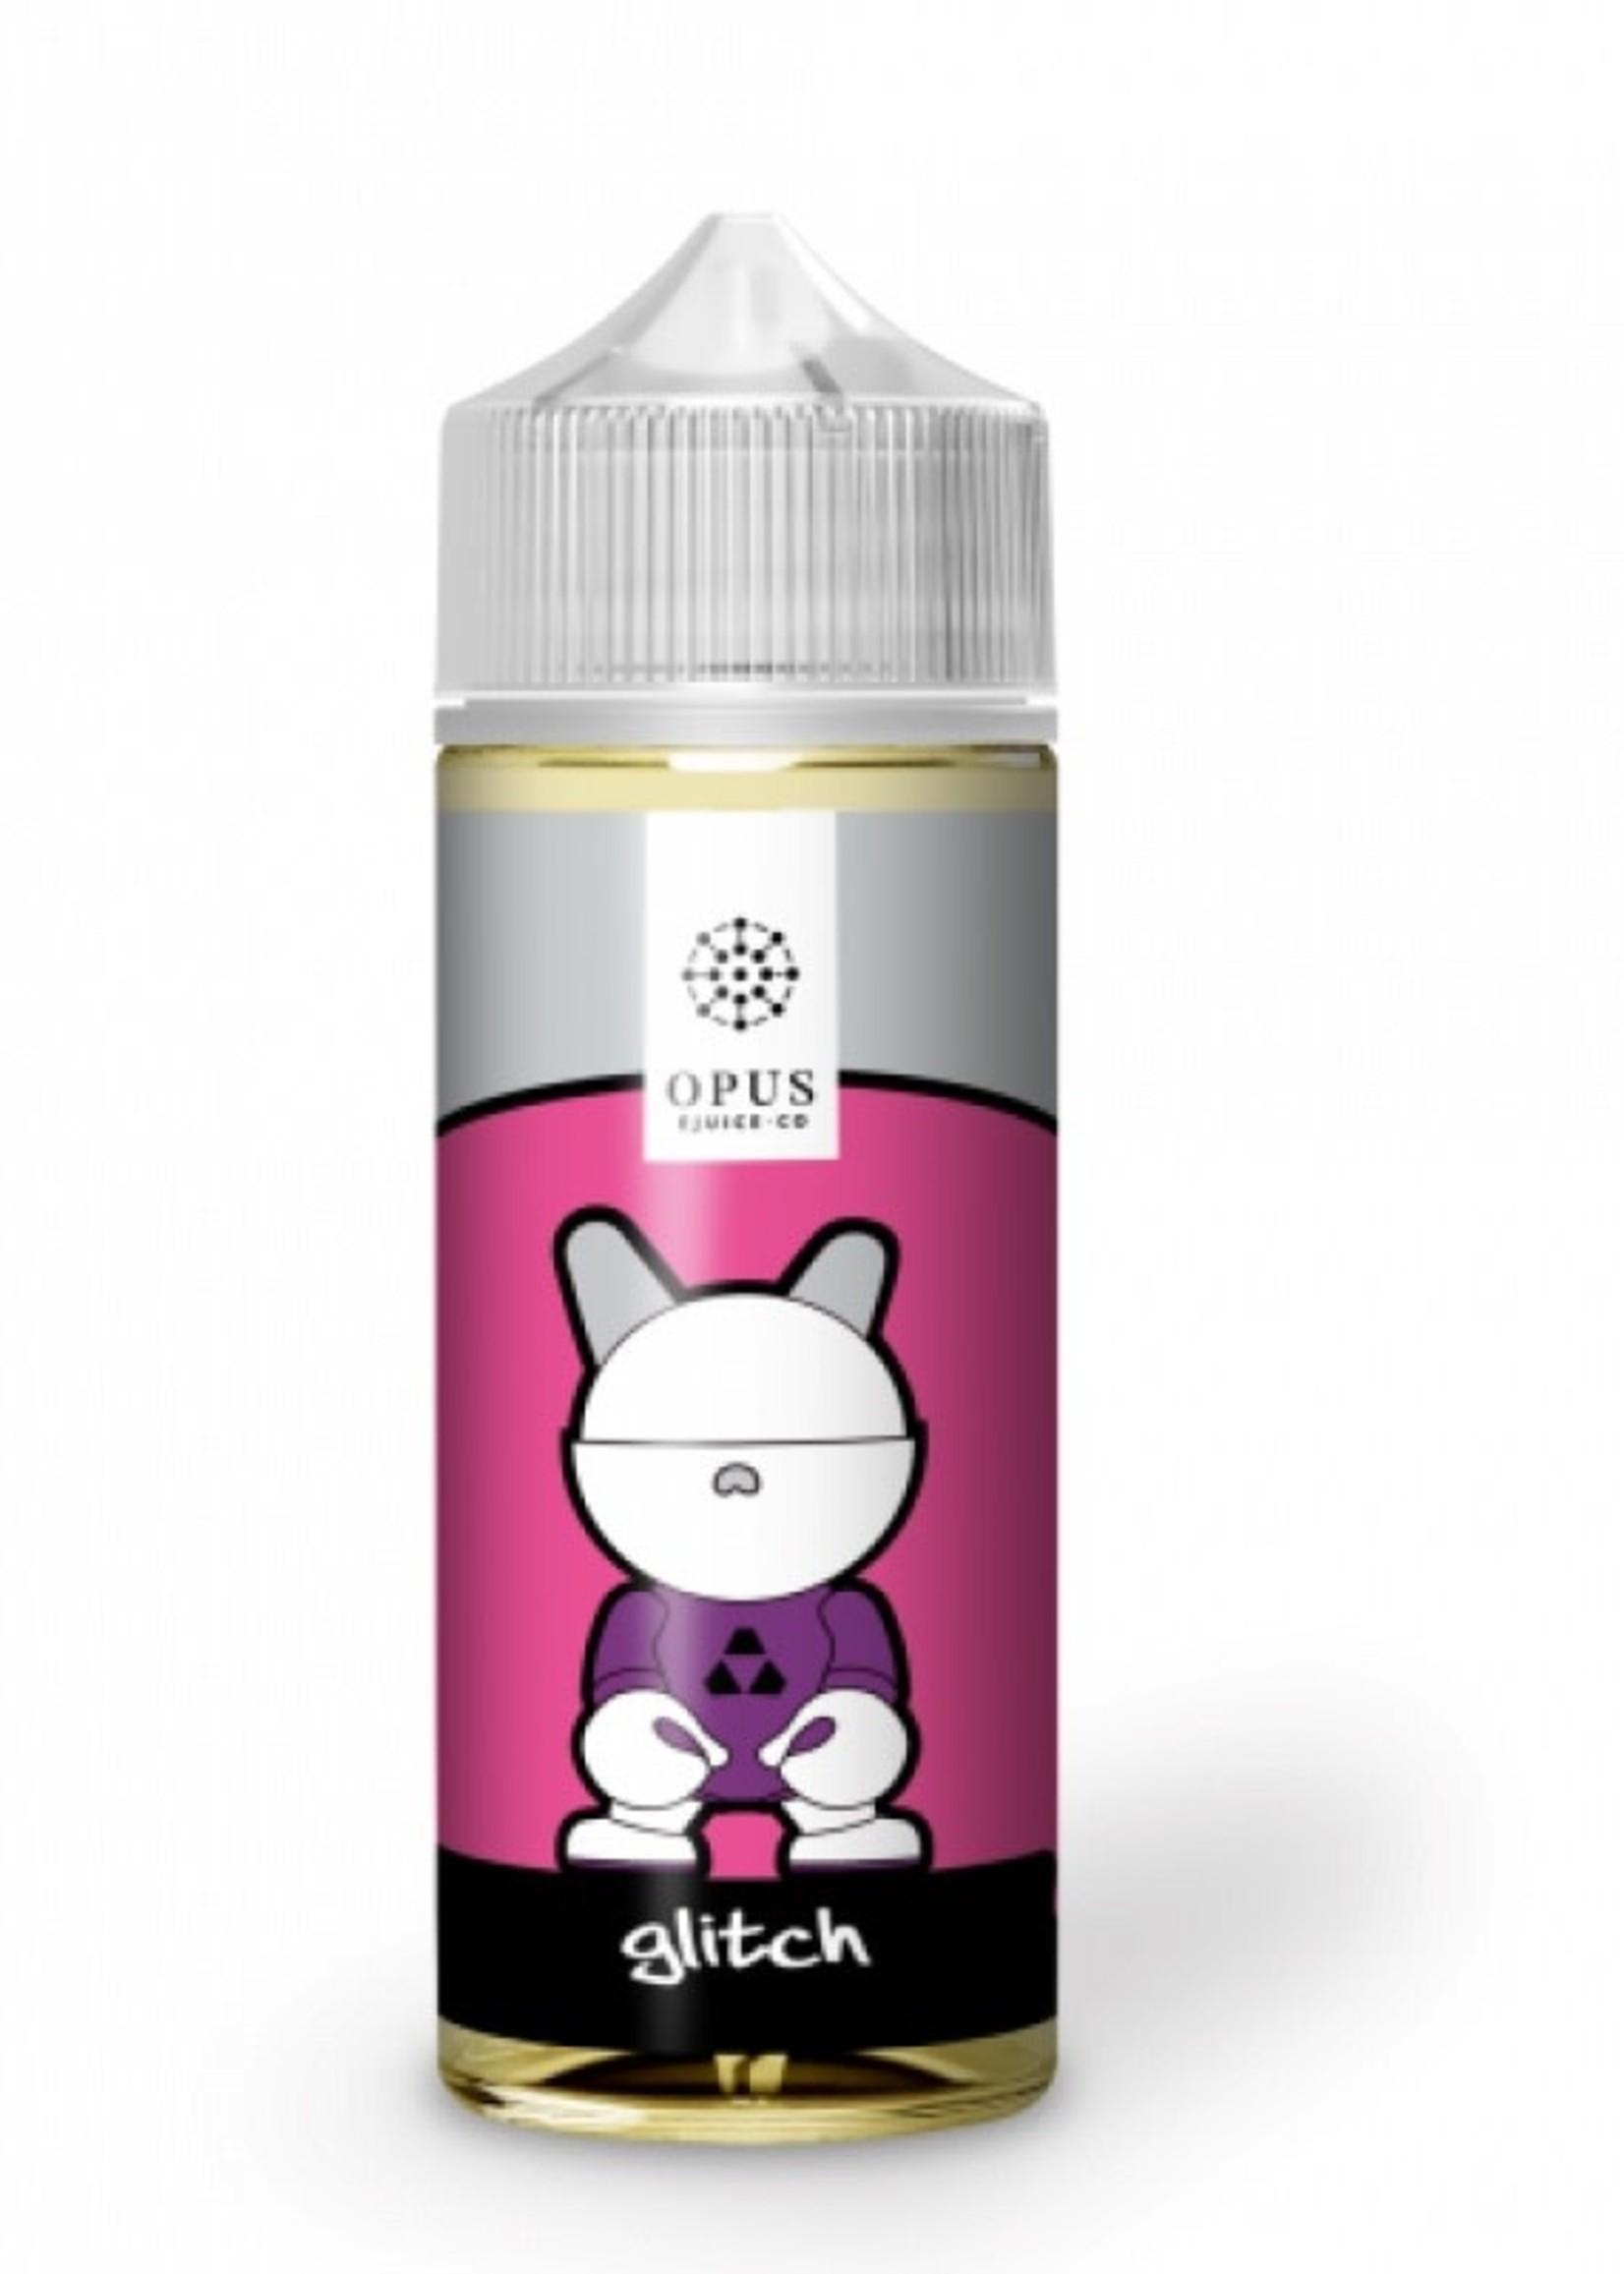 Opus Vape flavour - Glitch 120ml- 3mg